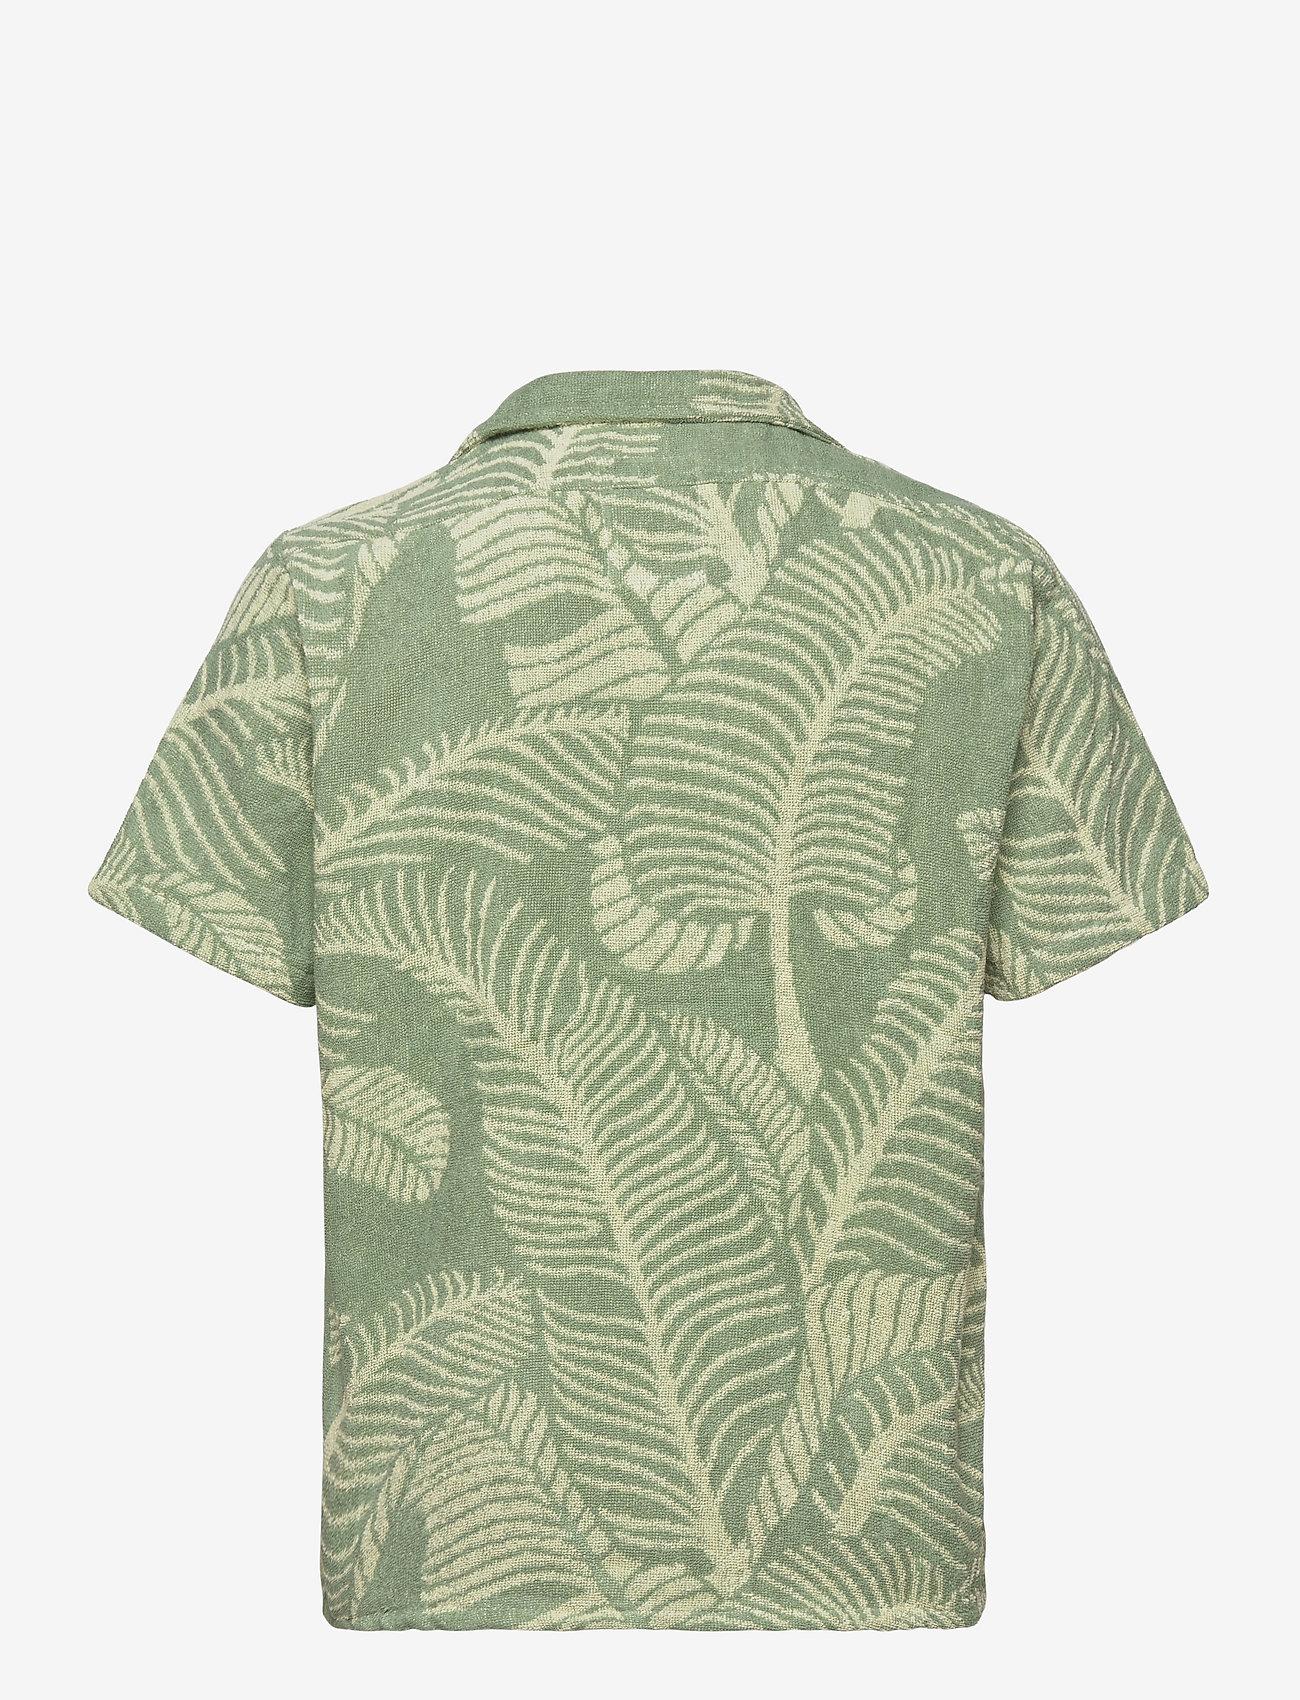 OAS - Banana Leaf Terry Shirt - green - 1